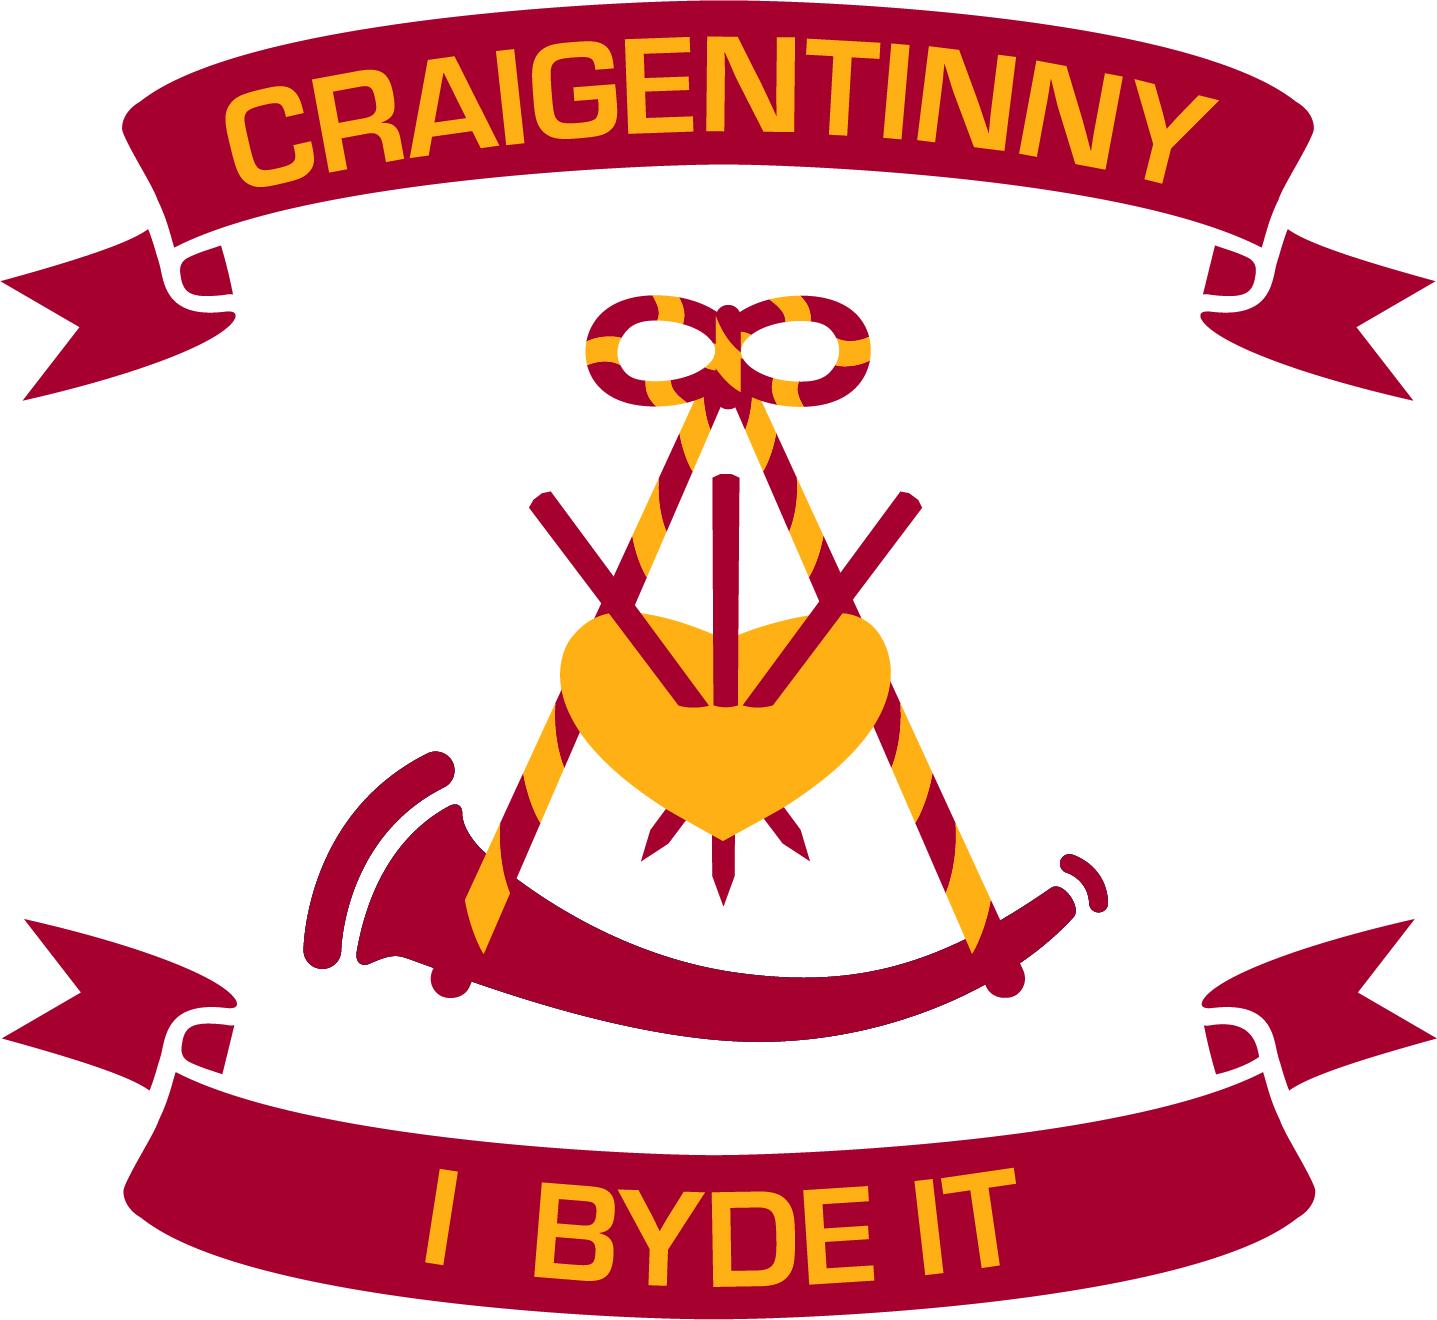 Craigentinny Primary